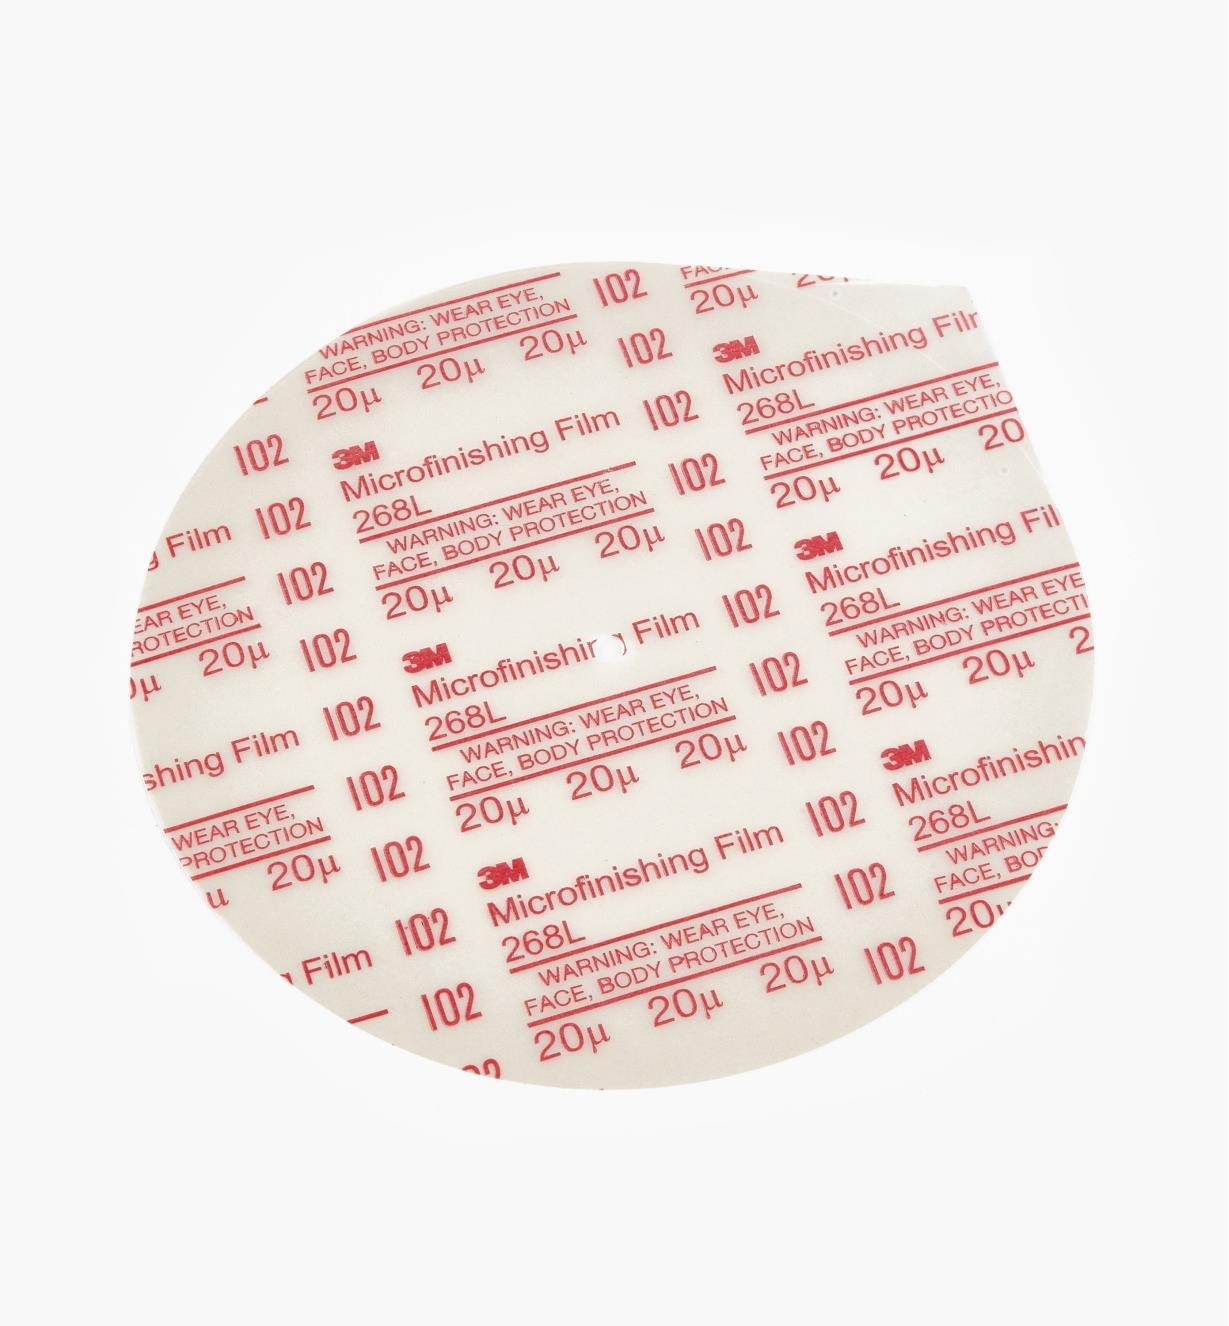 05M3023 - Disque en oxyde d'aluminium de 8po, grain500